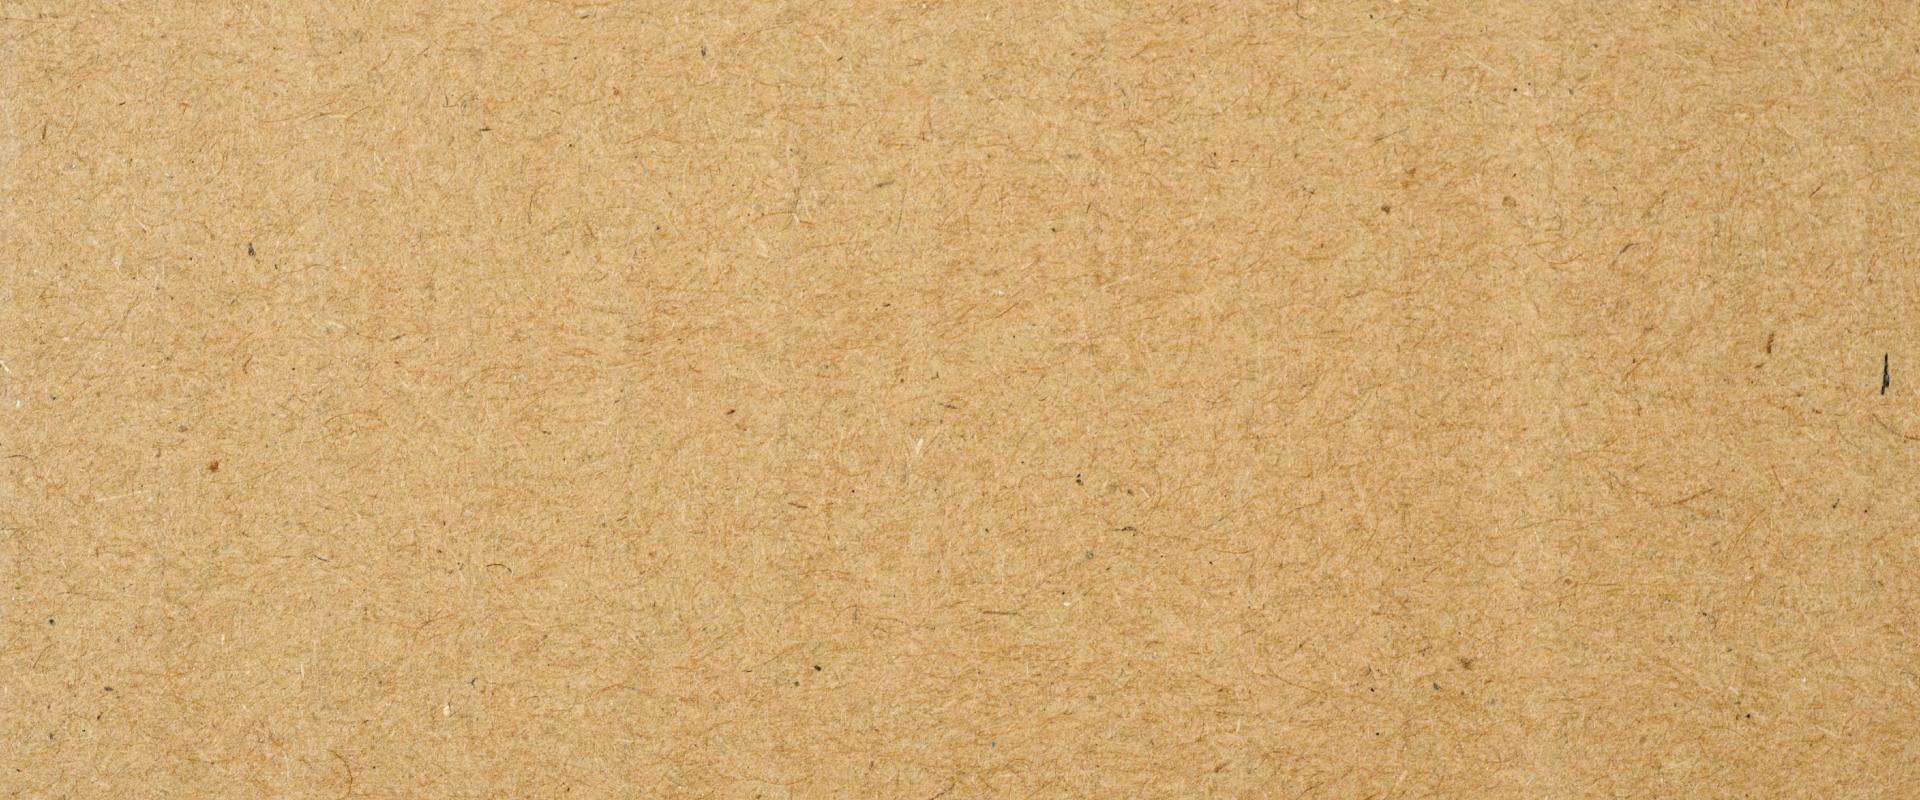 Hd Nostalgic Paper Background Image Matte Paper Texture